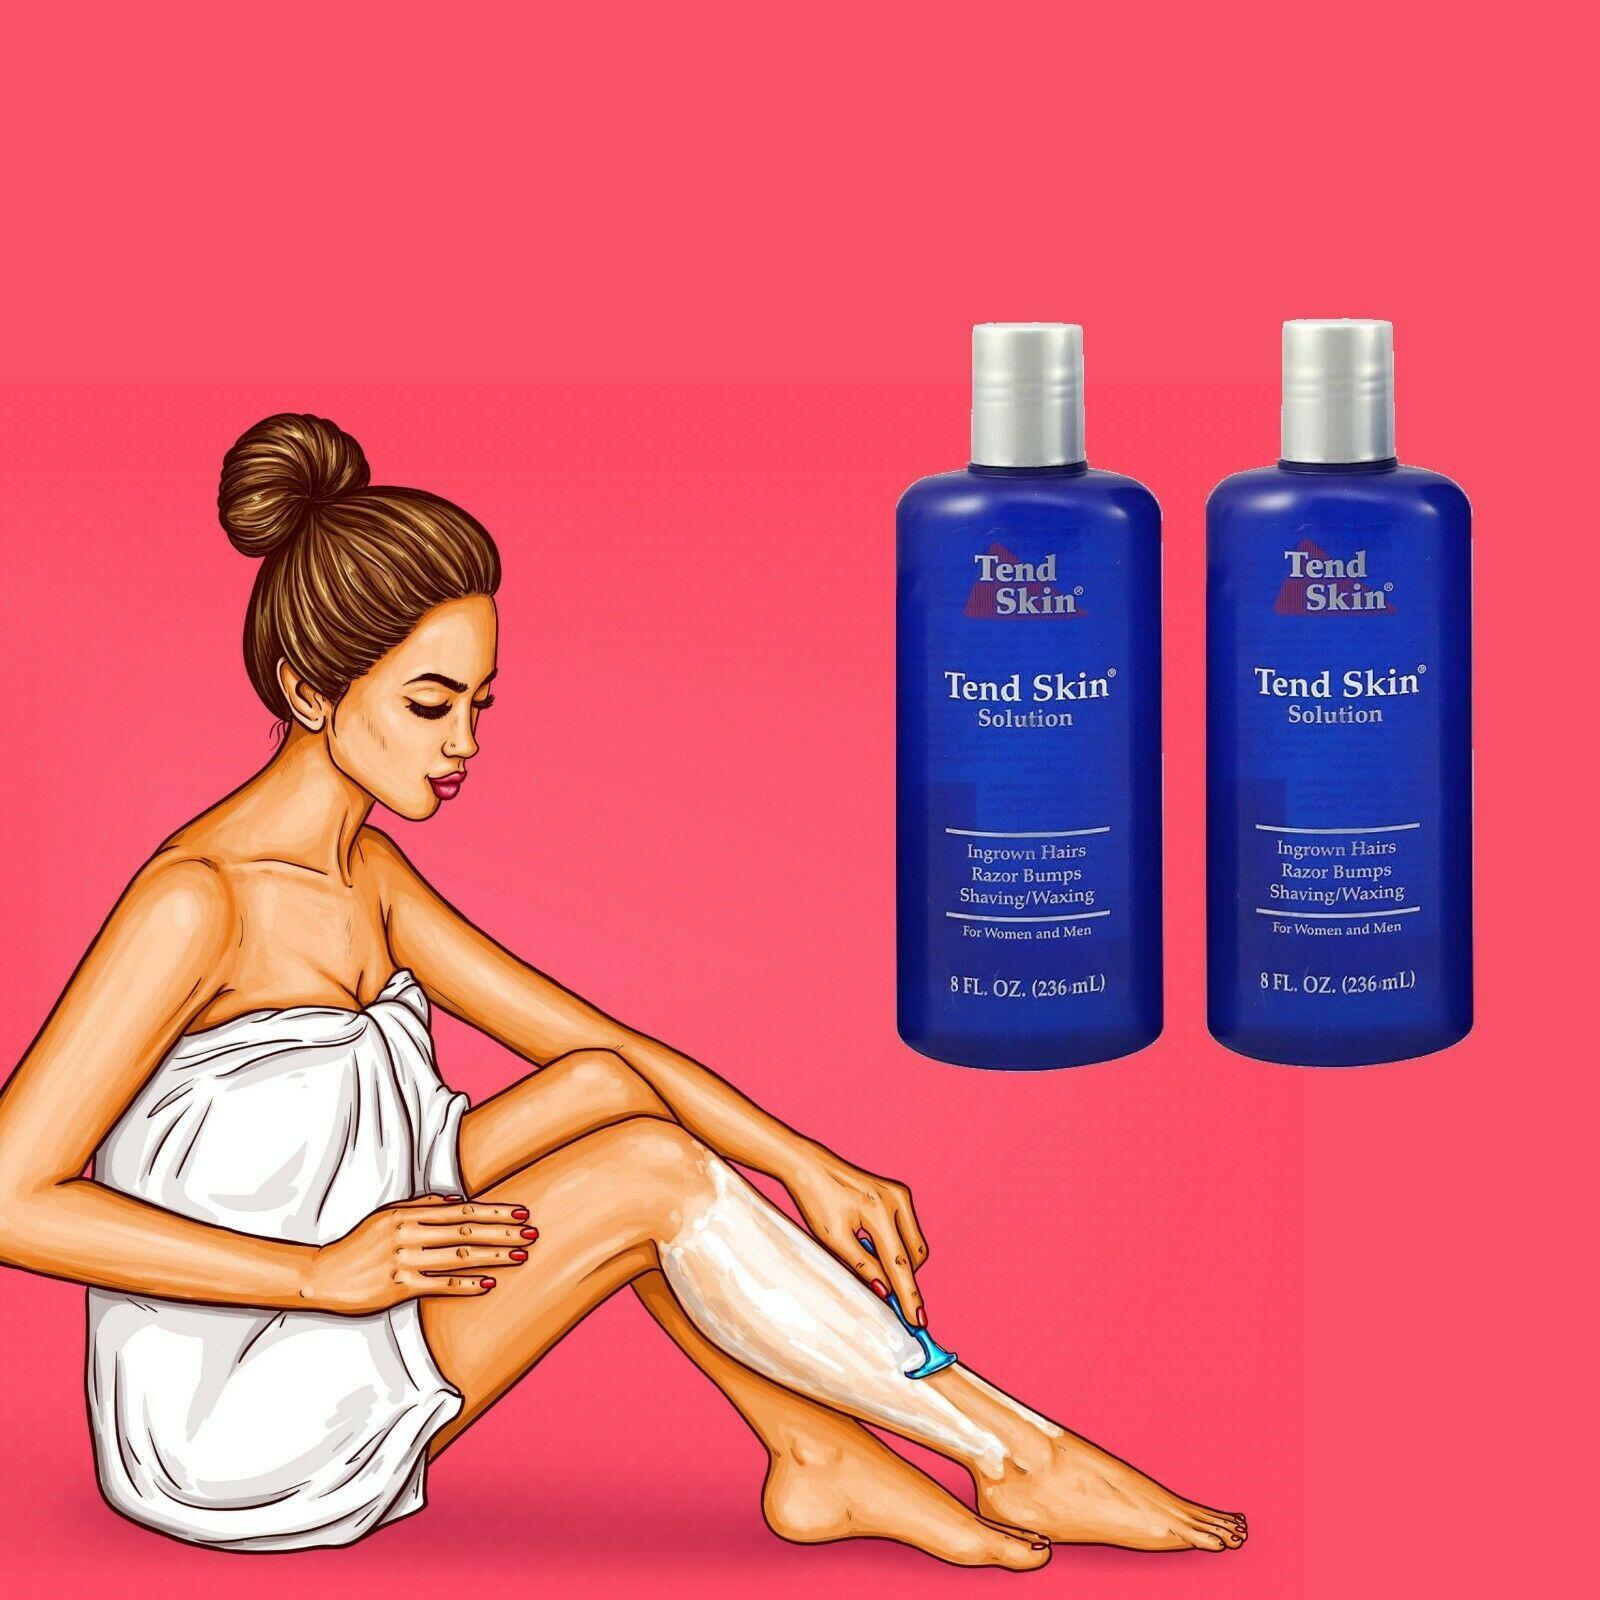 Tend Skin Solution 2 X 8oz Liquid Ingrown Hair Razor Bumps Burns Exp03 2021 609722353854 Ebay Tend Skin Skin Solutions Ingrown Hair